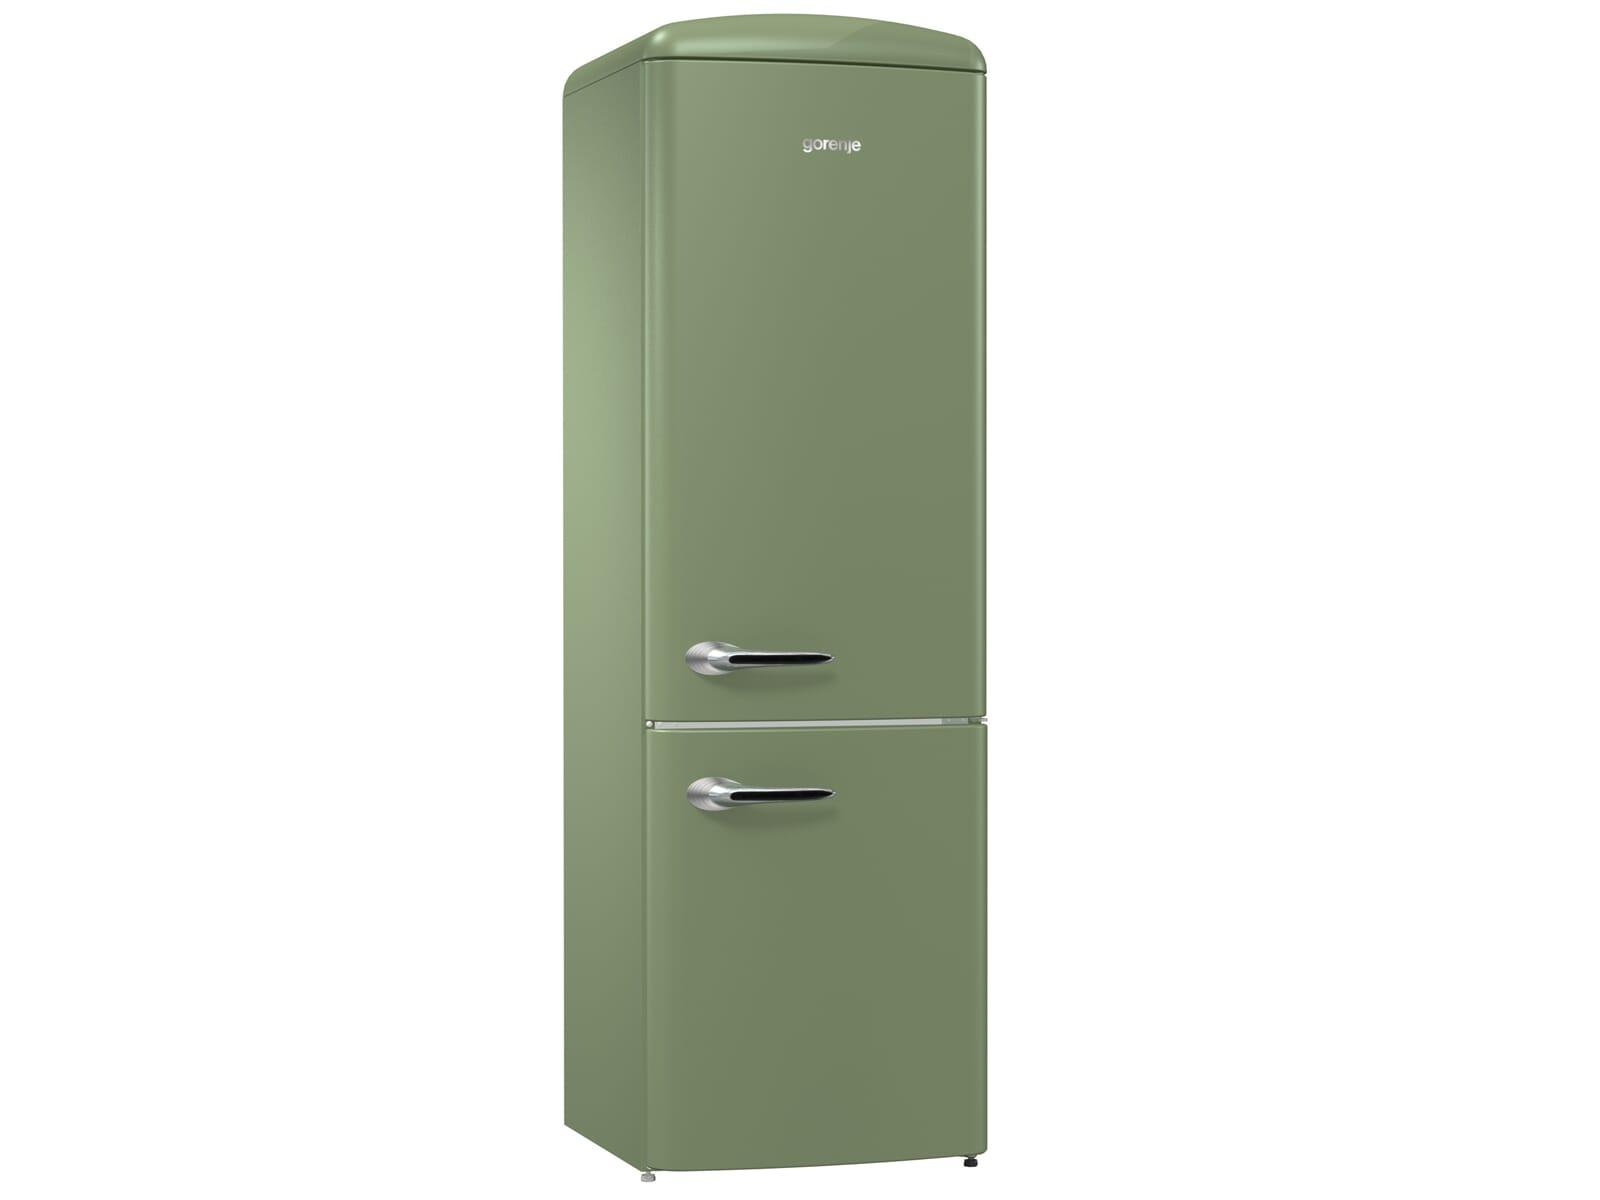 Gorenje Kühlschrank Retro Schwarz : Kühlschrank mit wassertank gorenje kühlschrank rot retro tracie a